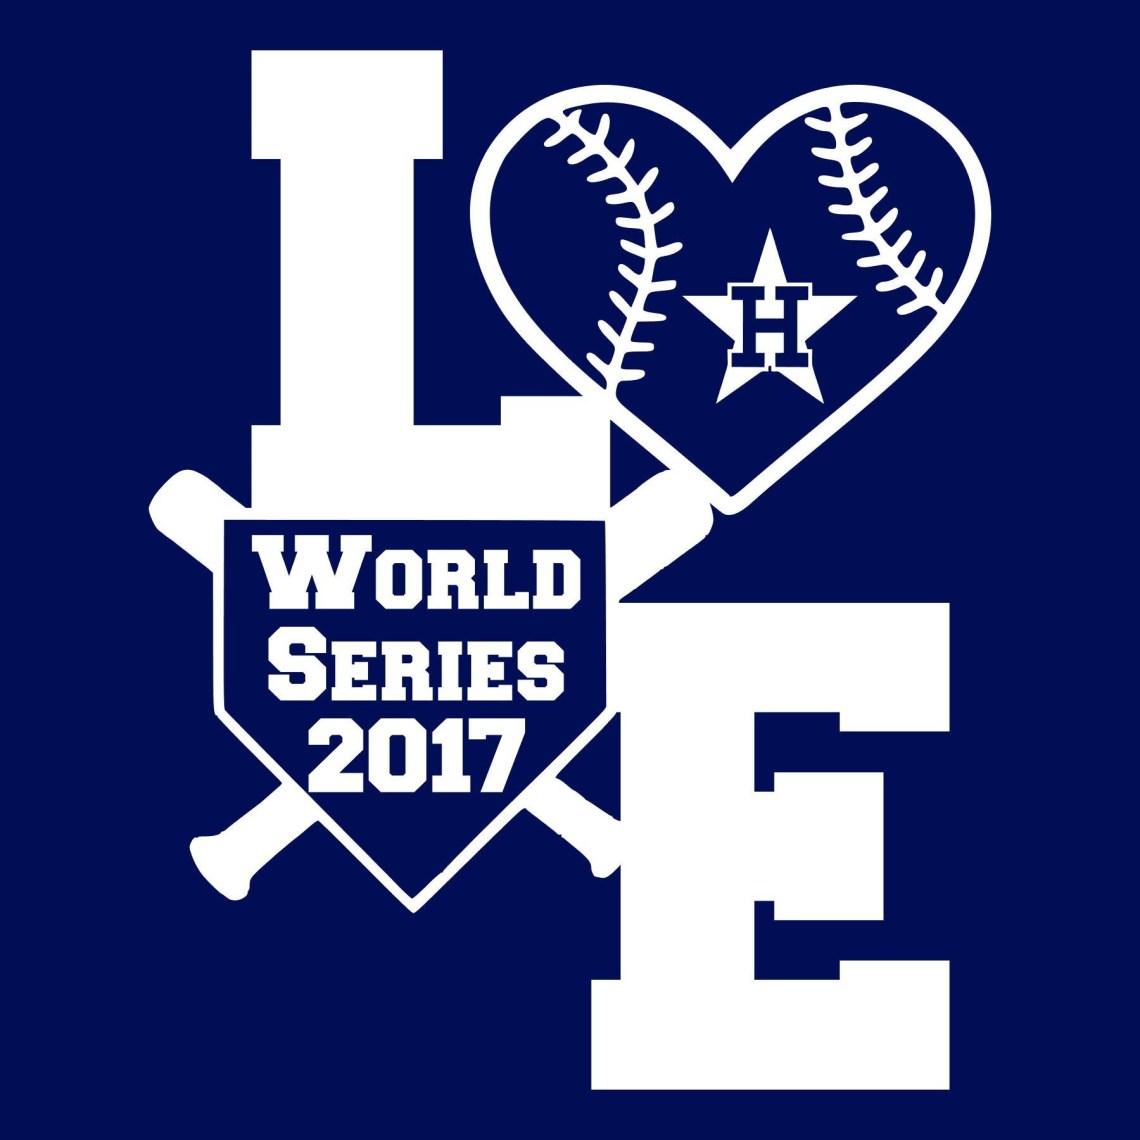 Download Digi-tizers Houston Astros LOVE World Series 2017 SVG Studio